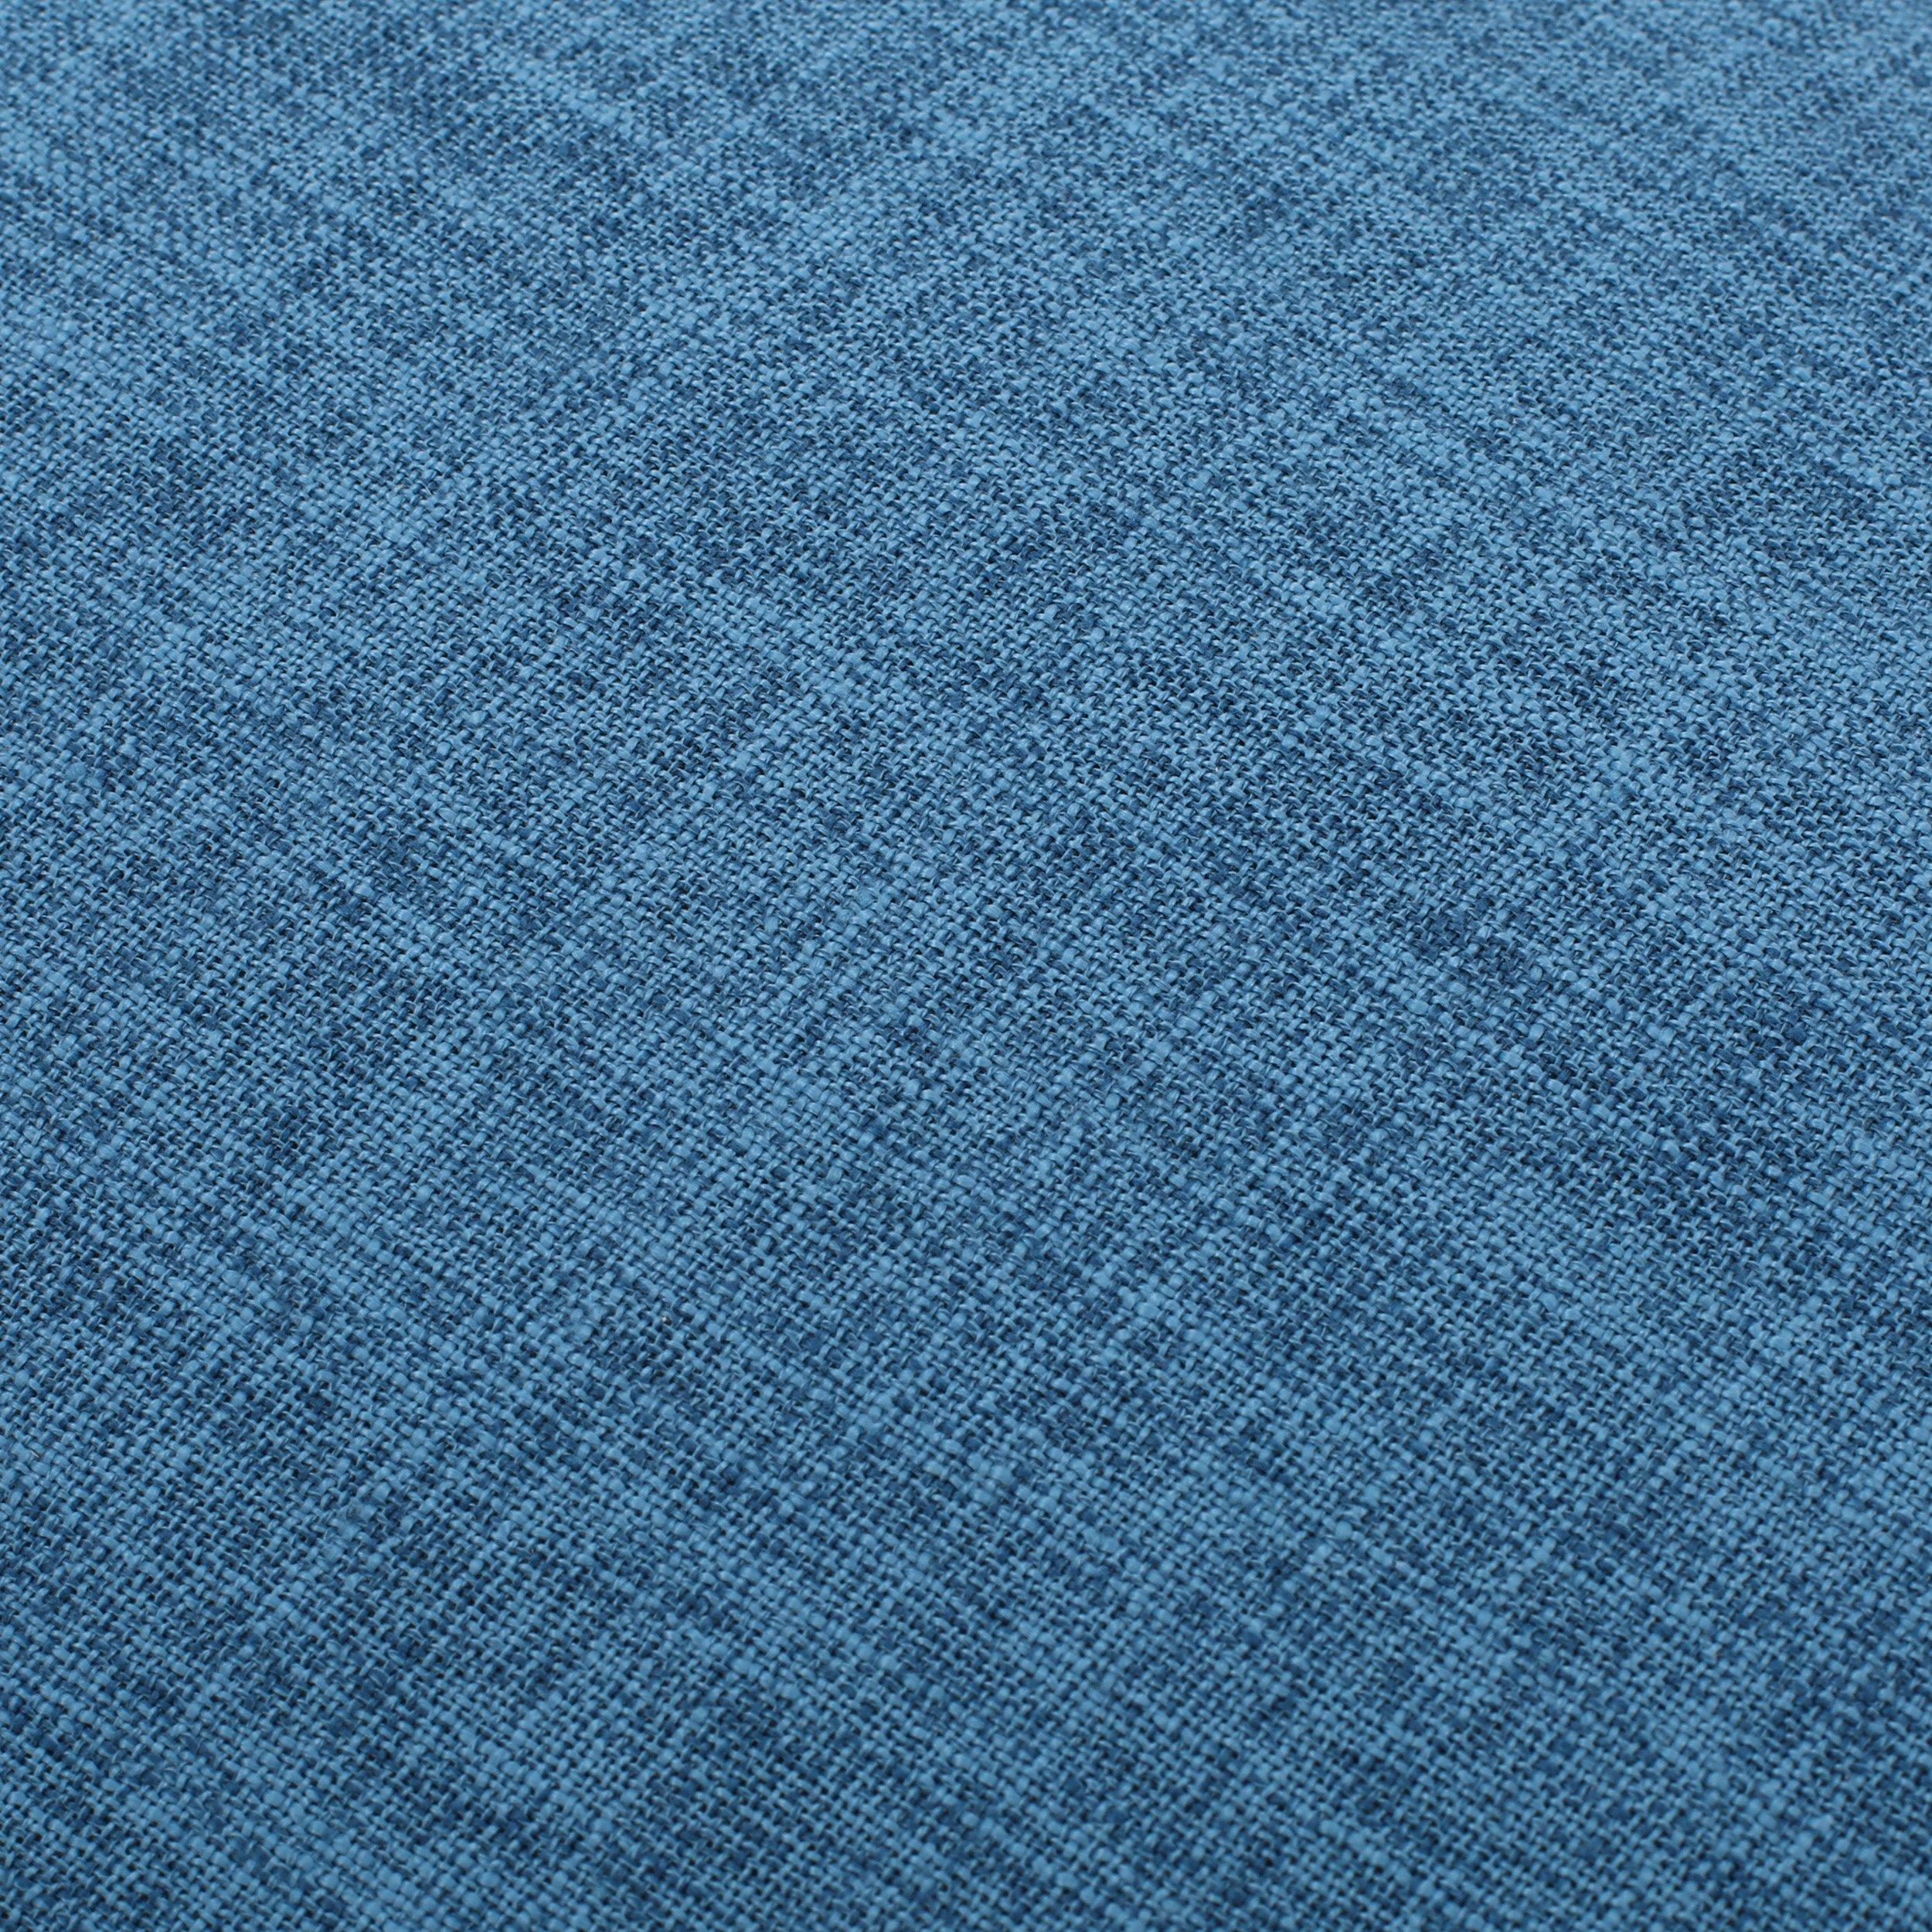 Dumont Mid Century Modern Fabric Ottoman (Blue) by GDF Studio (Image #5)